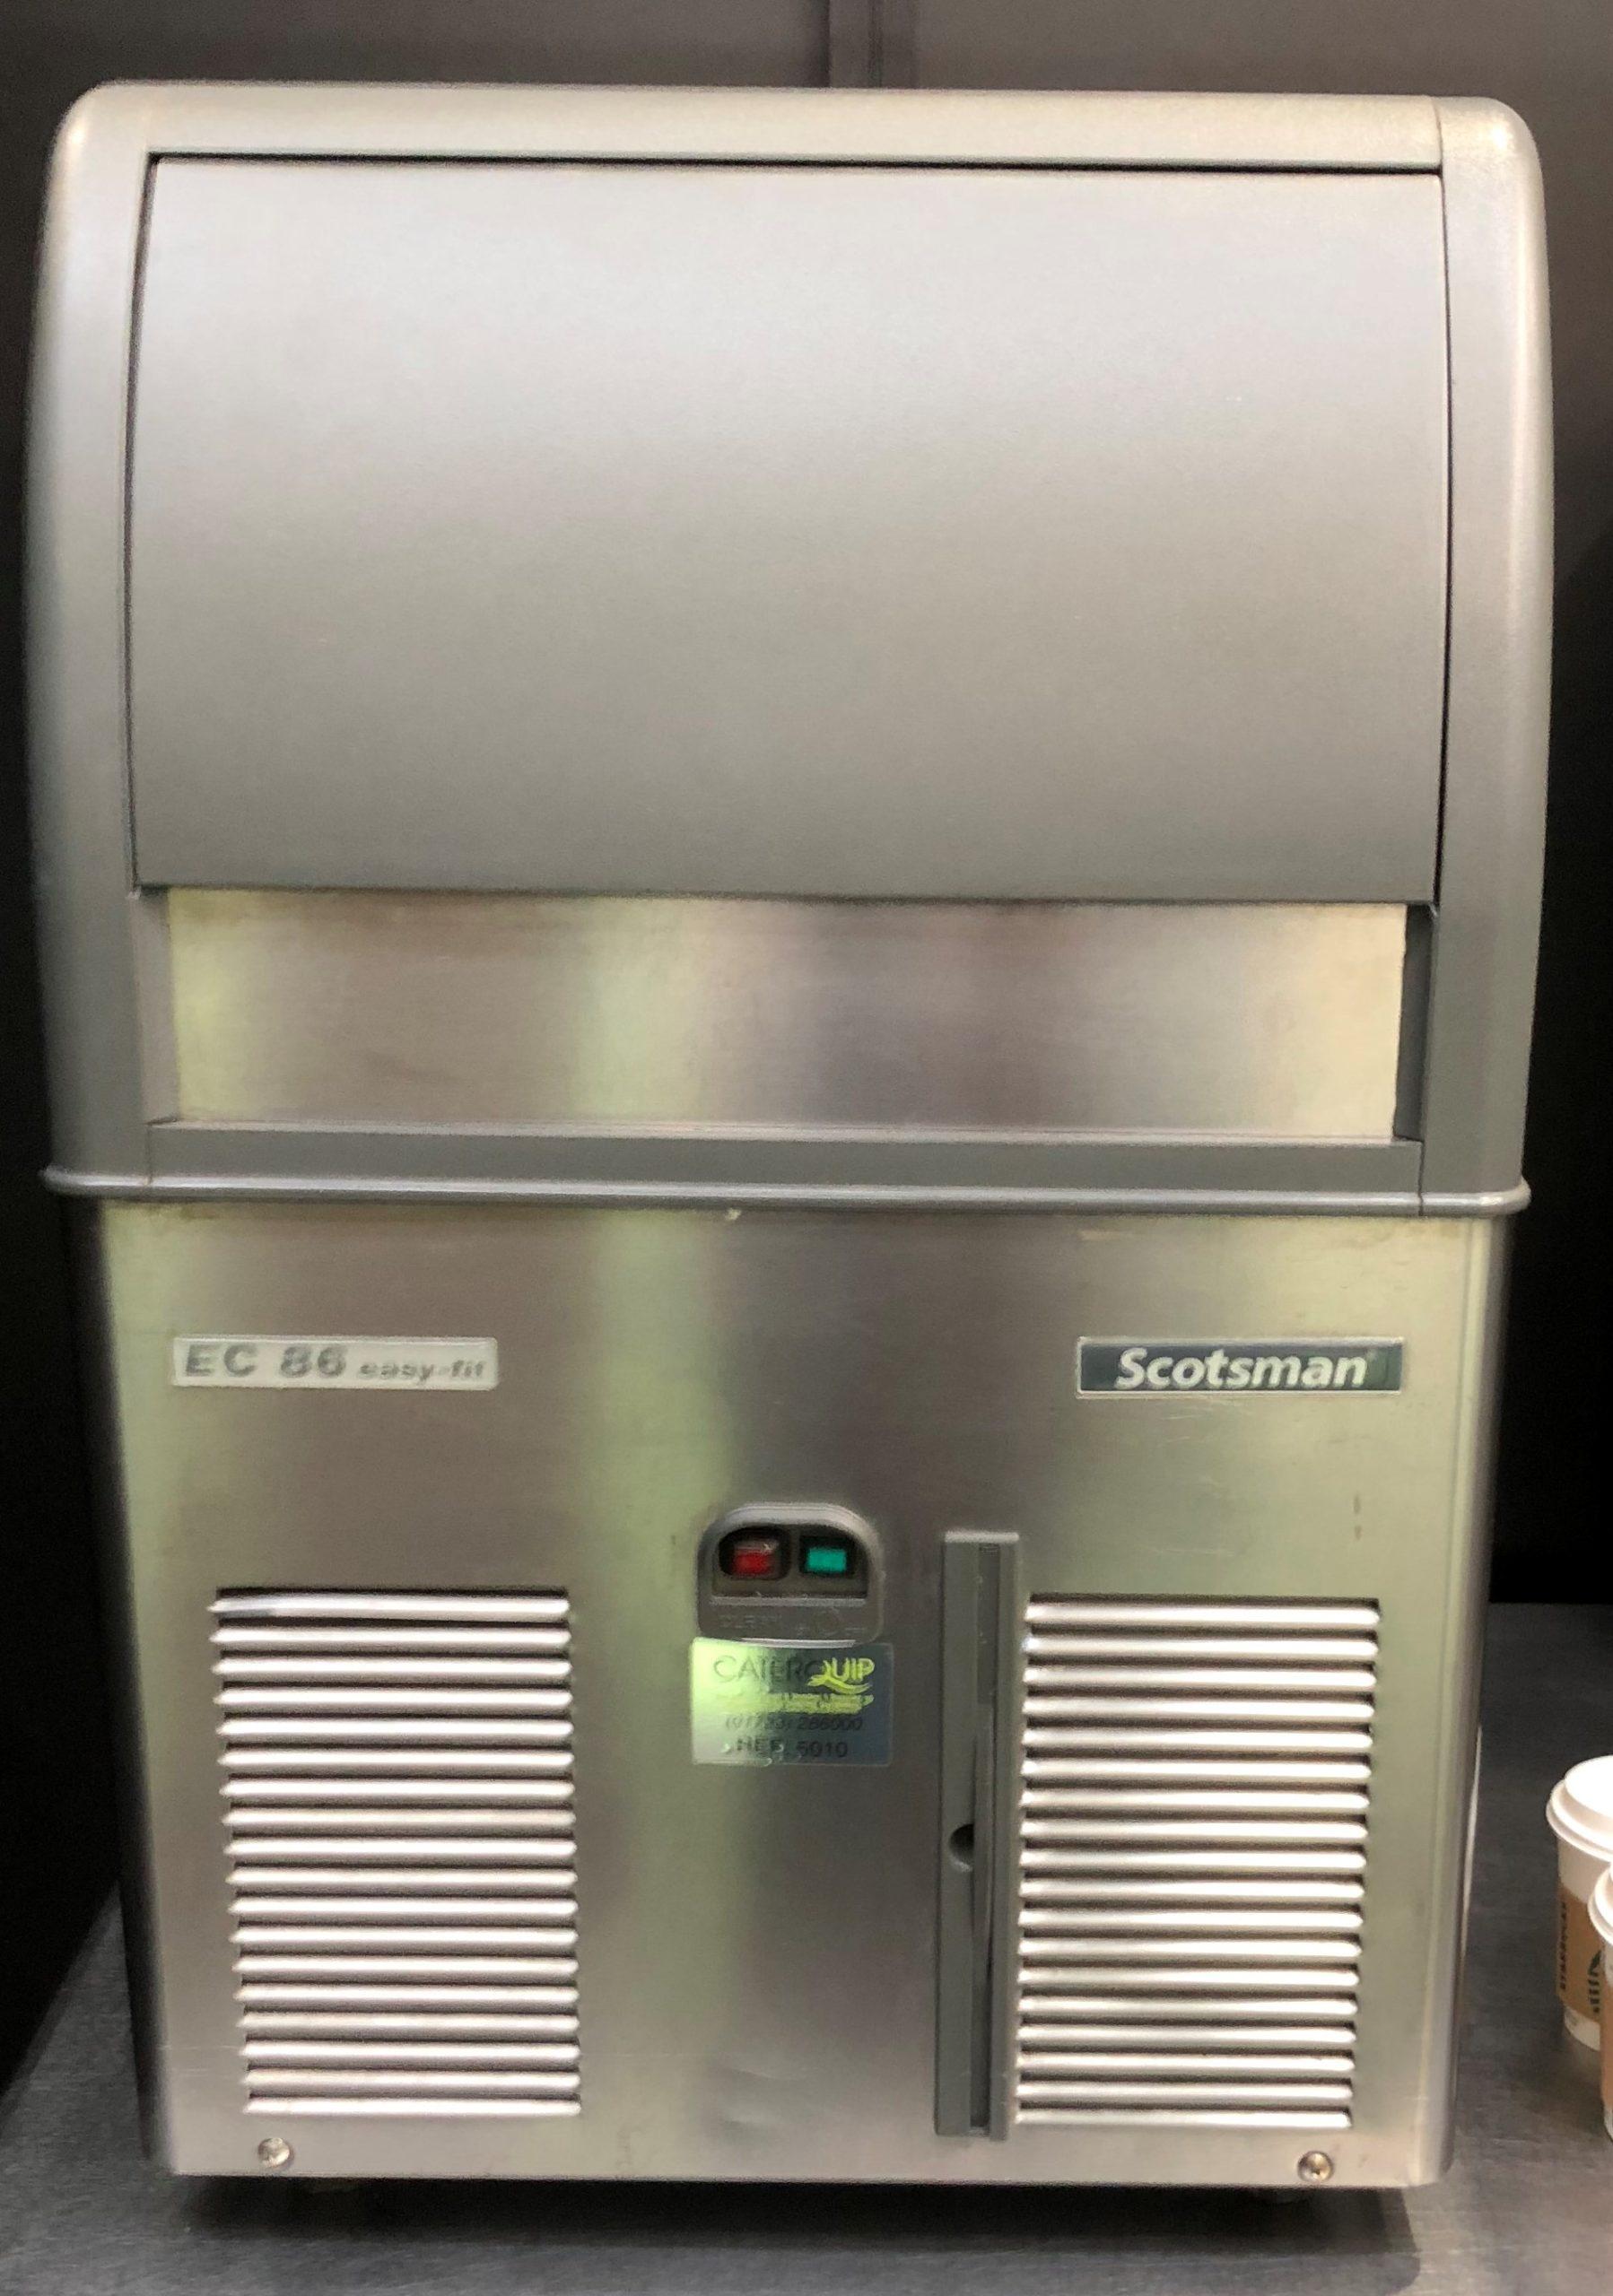 SCOTSMAN EC86 Ice Maker